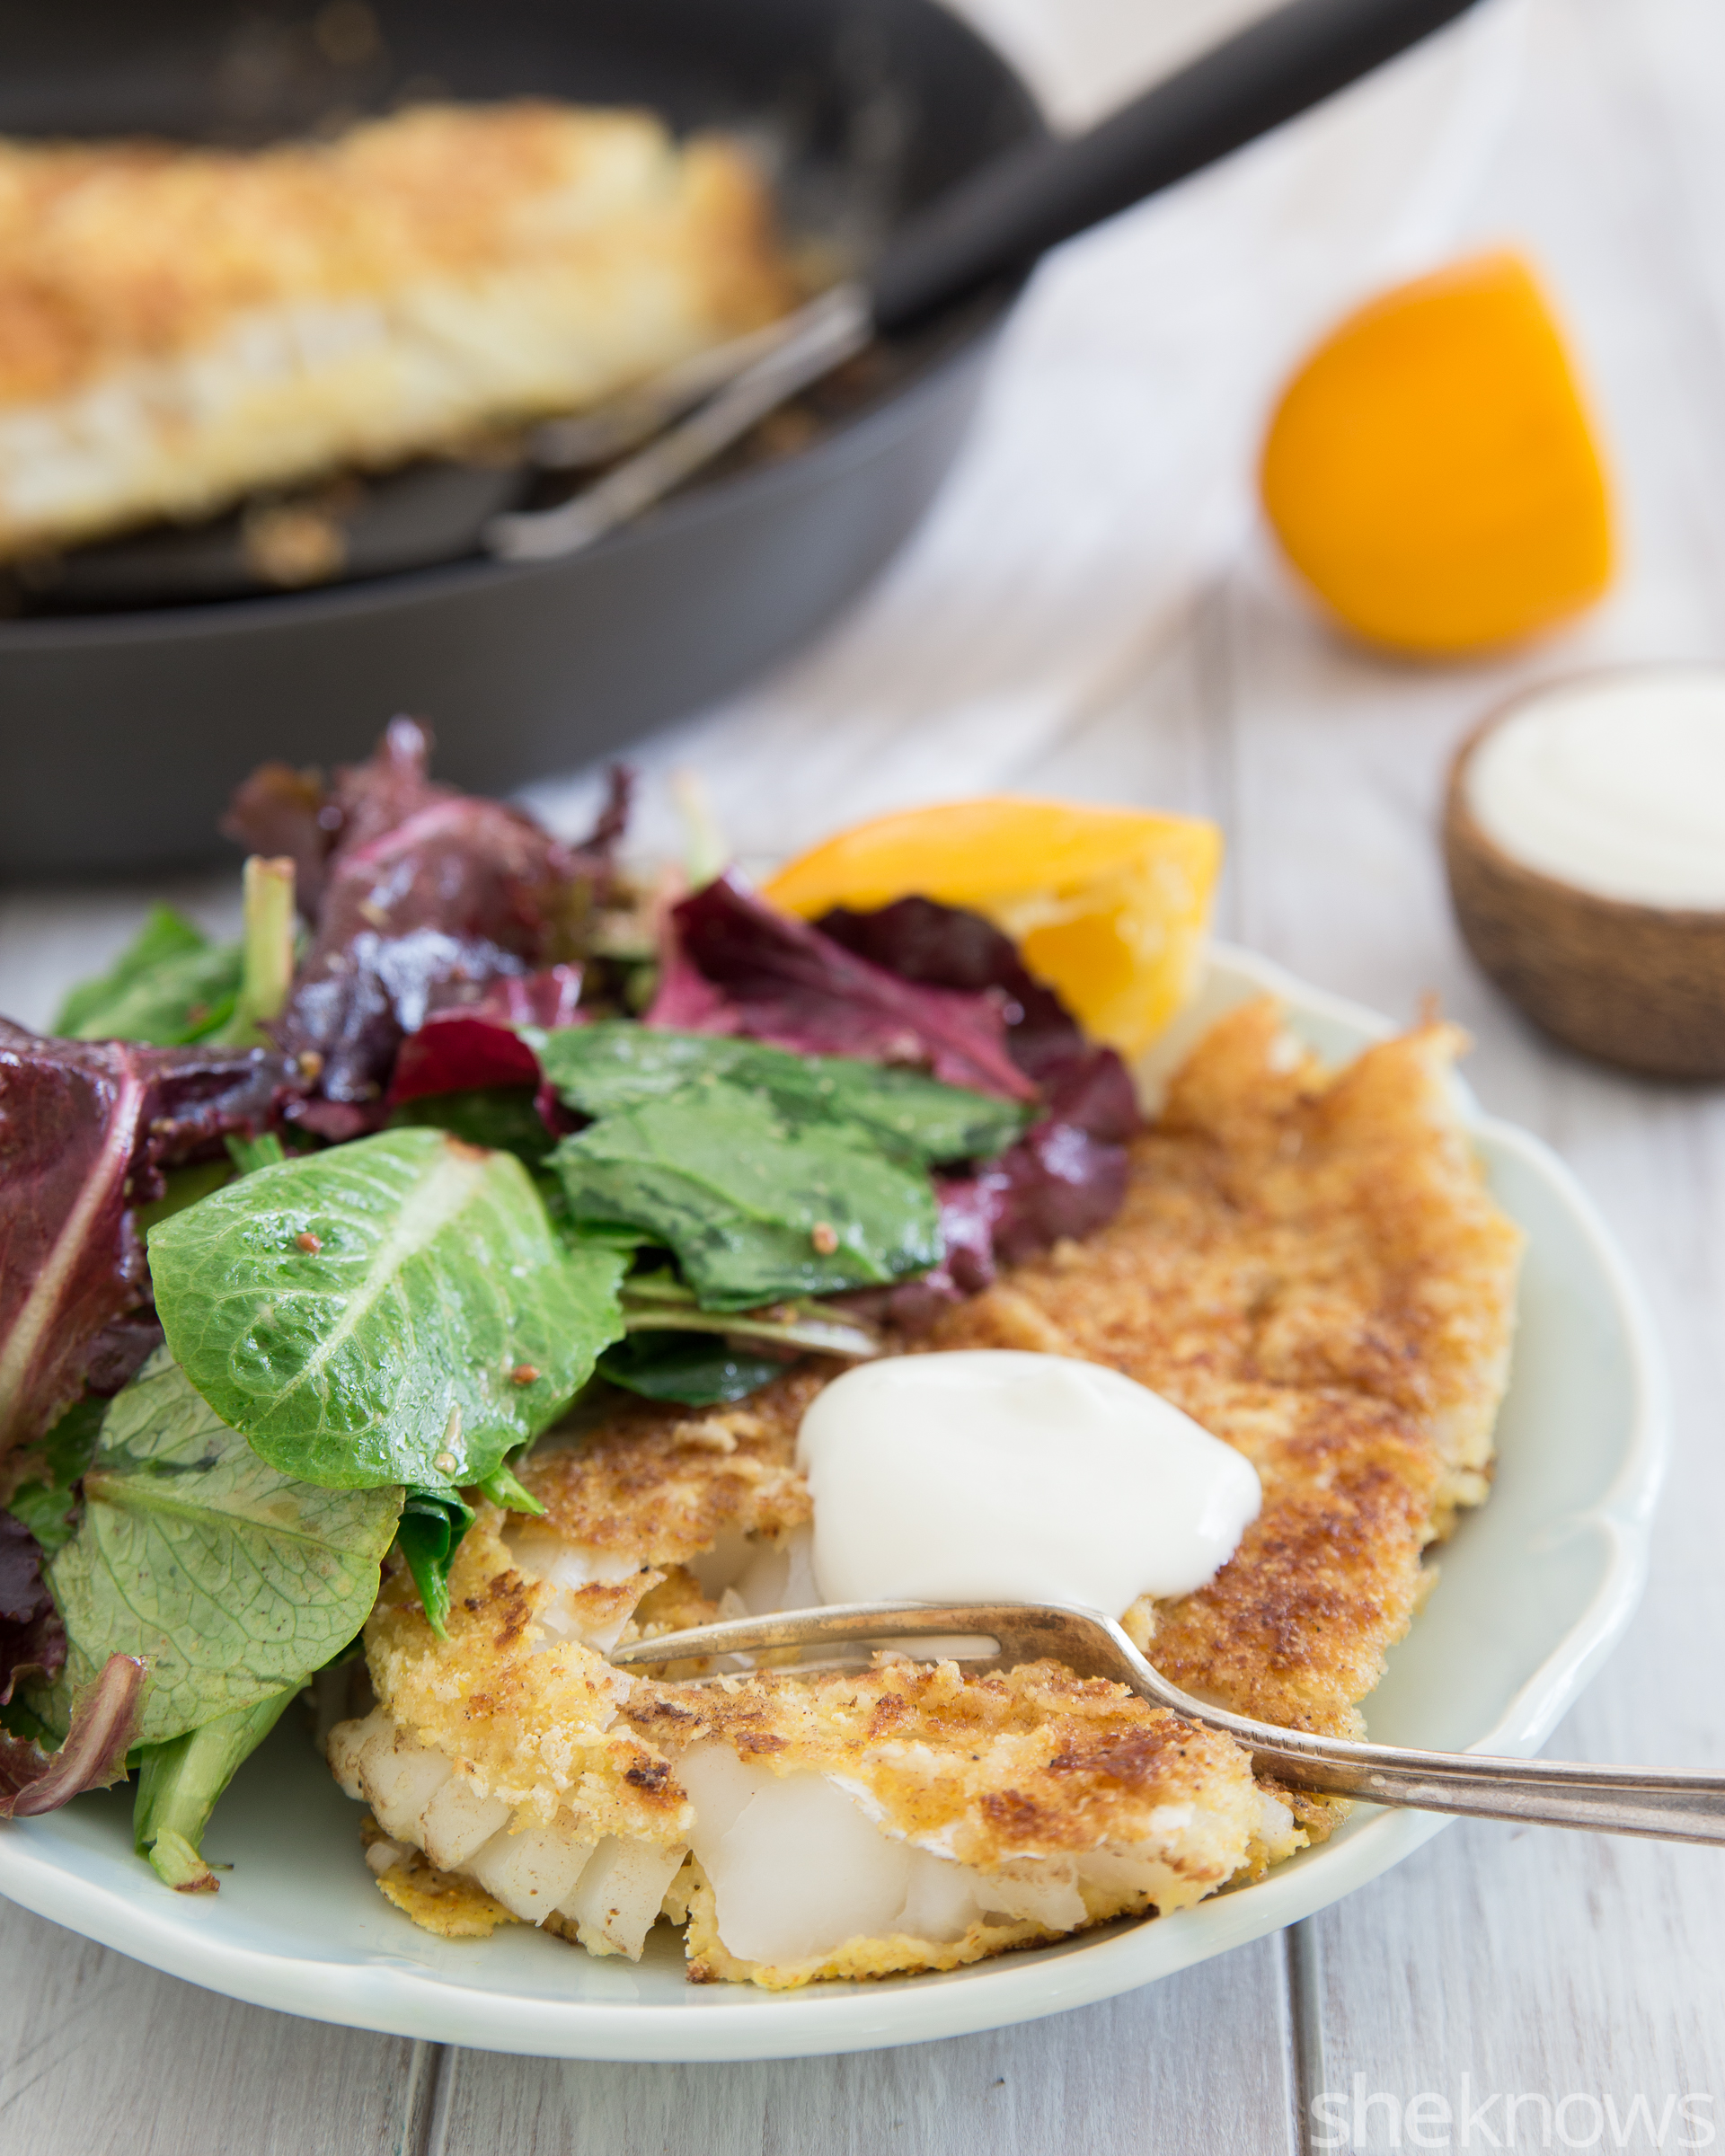 Pan-fried halibut with lemon-yogurt sauce recipe